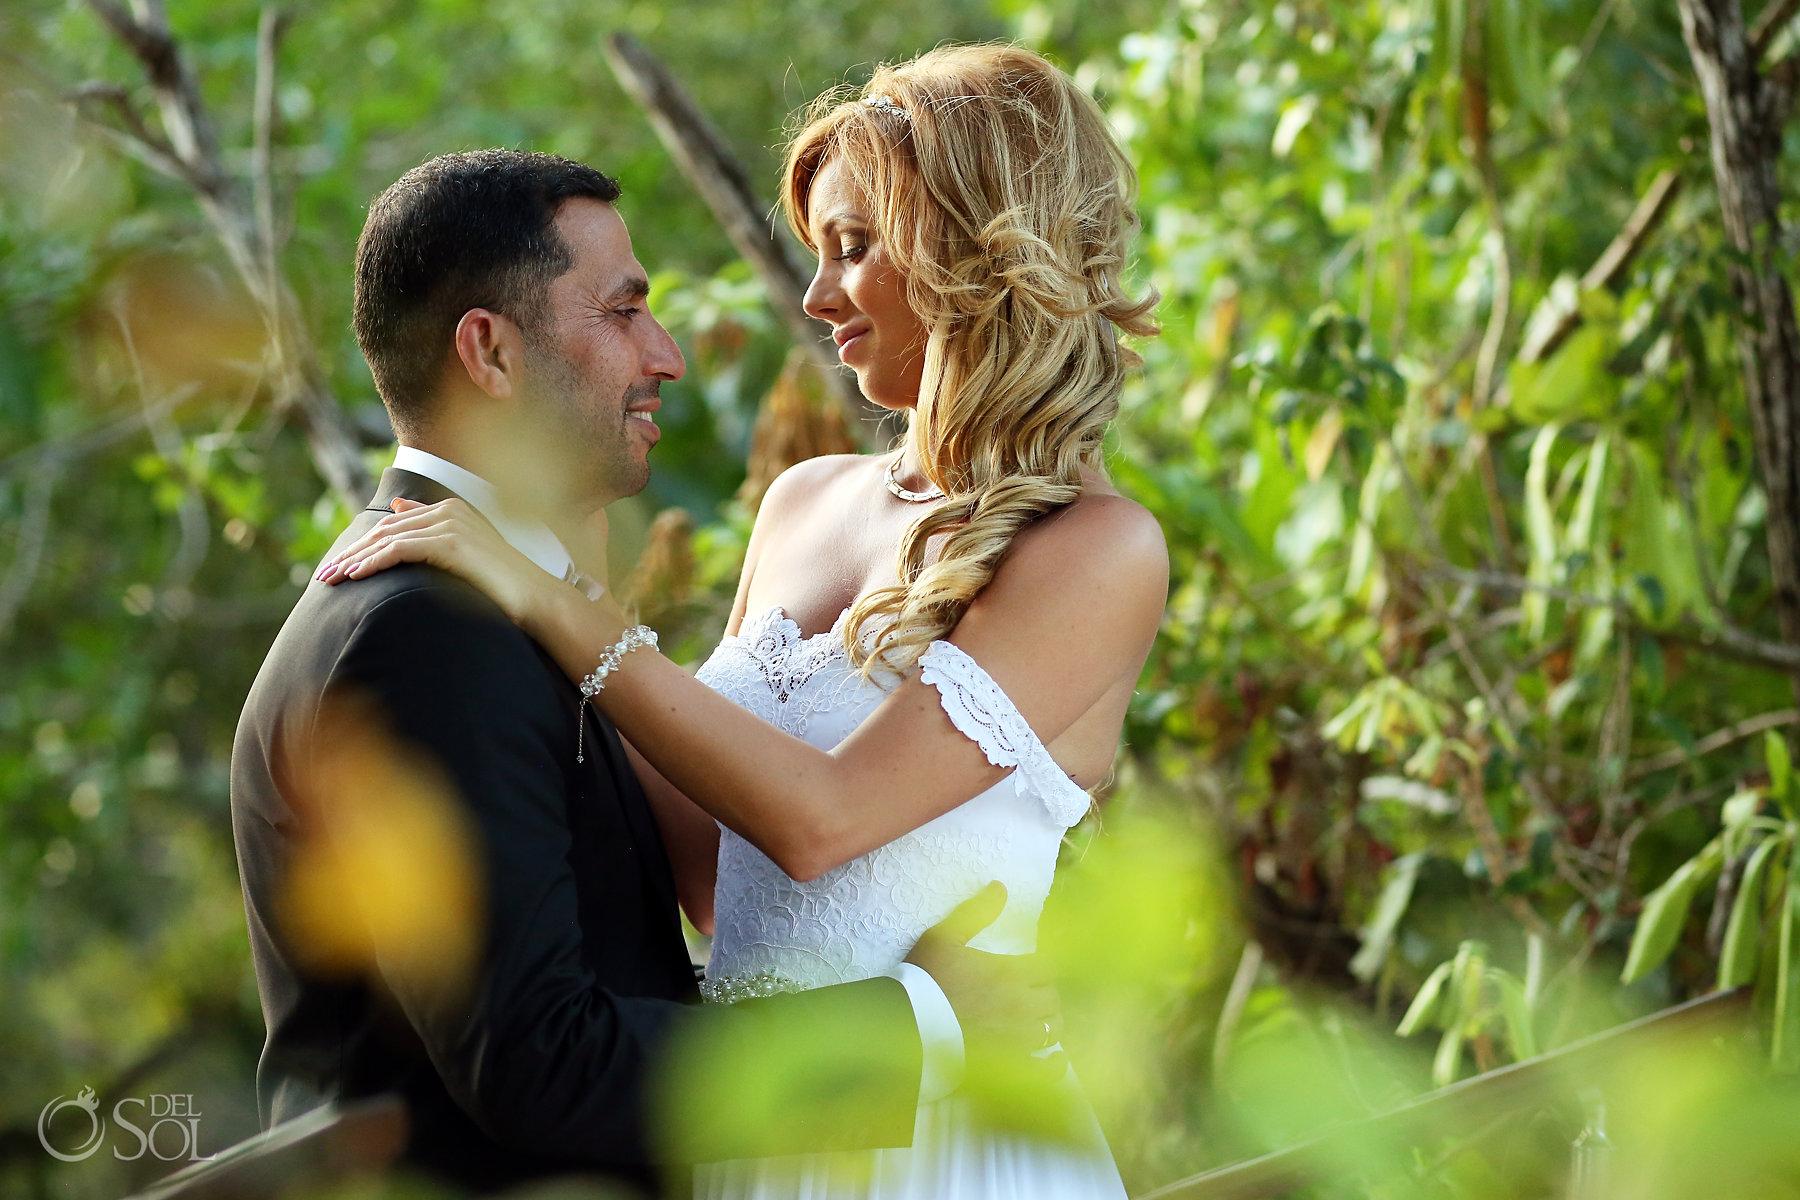 Romantic Nature Bride and Groom Portrait Best Elopement Locations Mexico